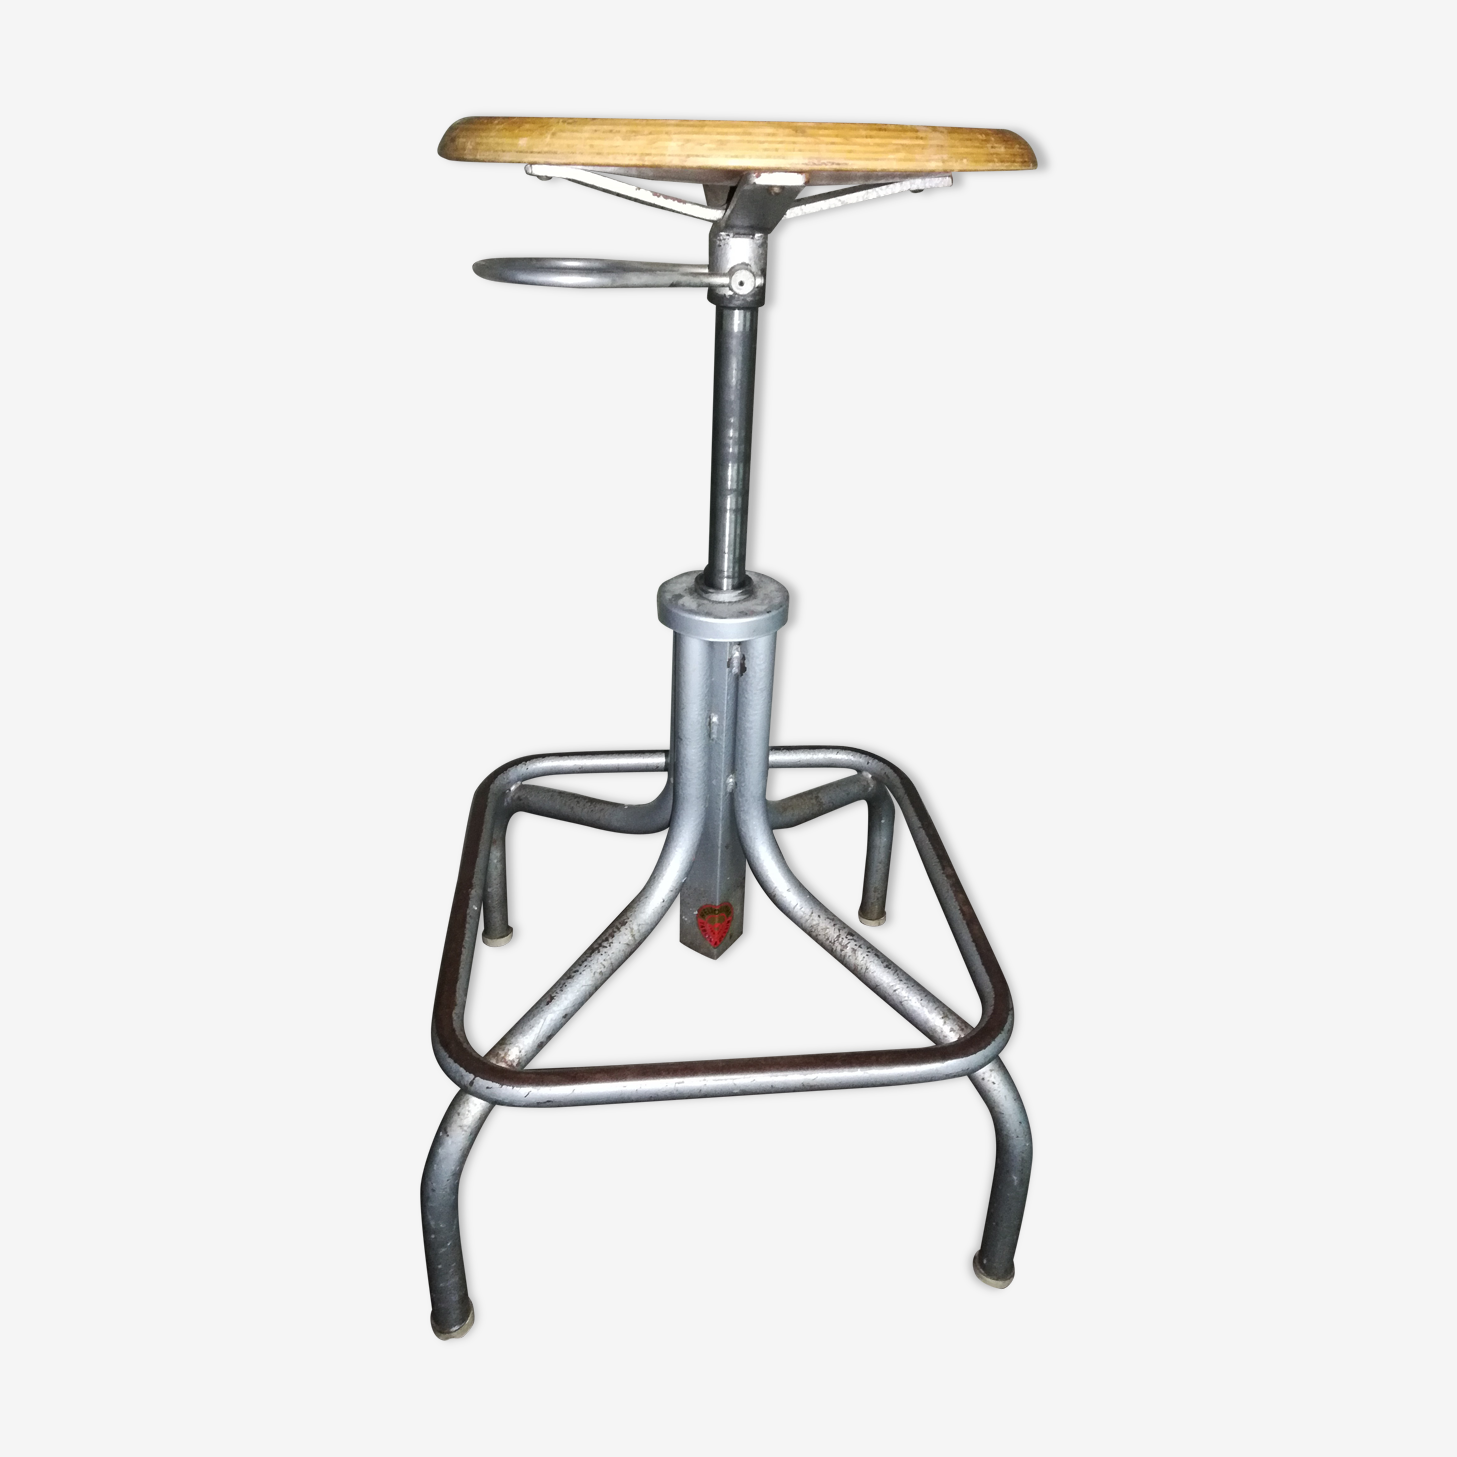 Industrial stool of designer brand Heliolithe